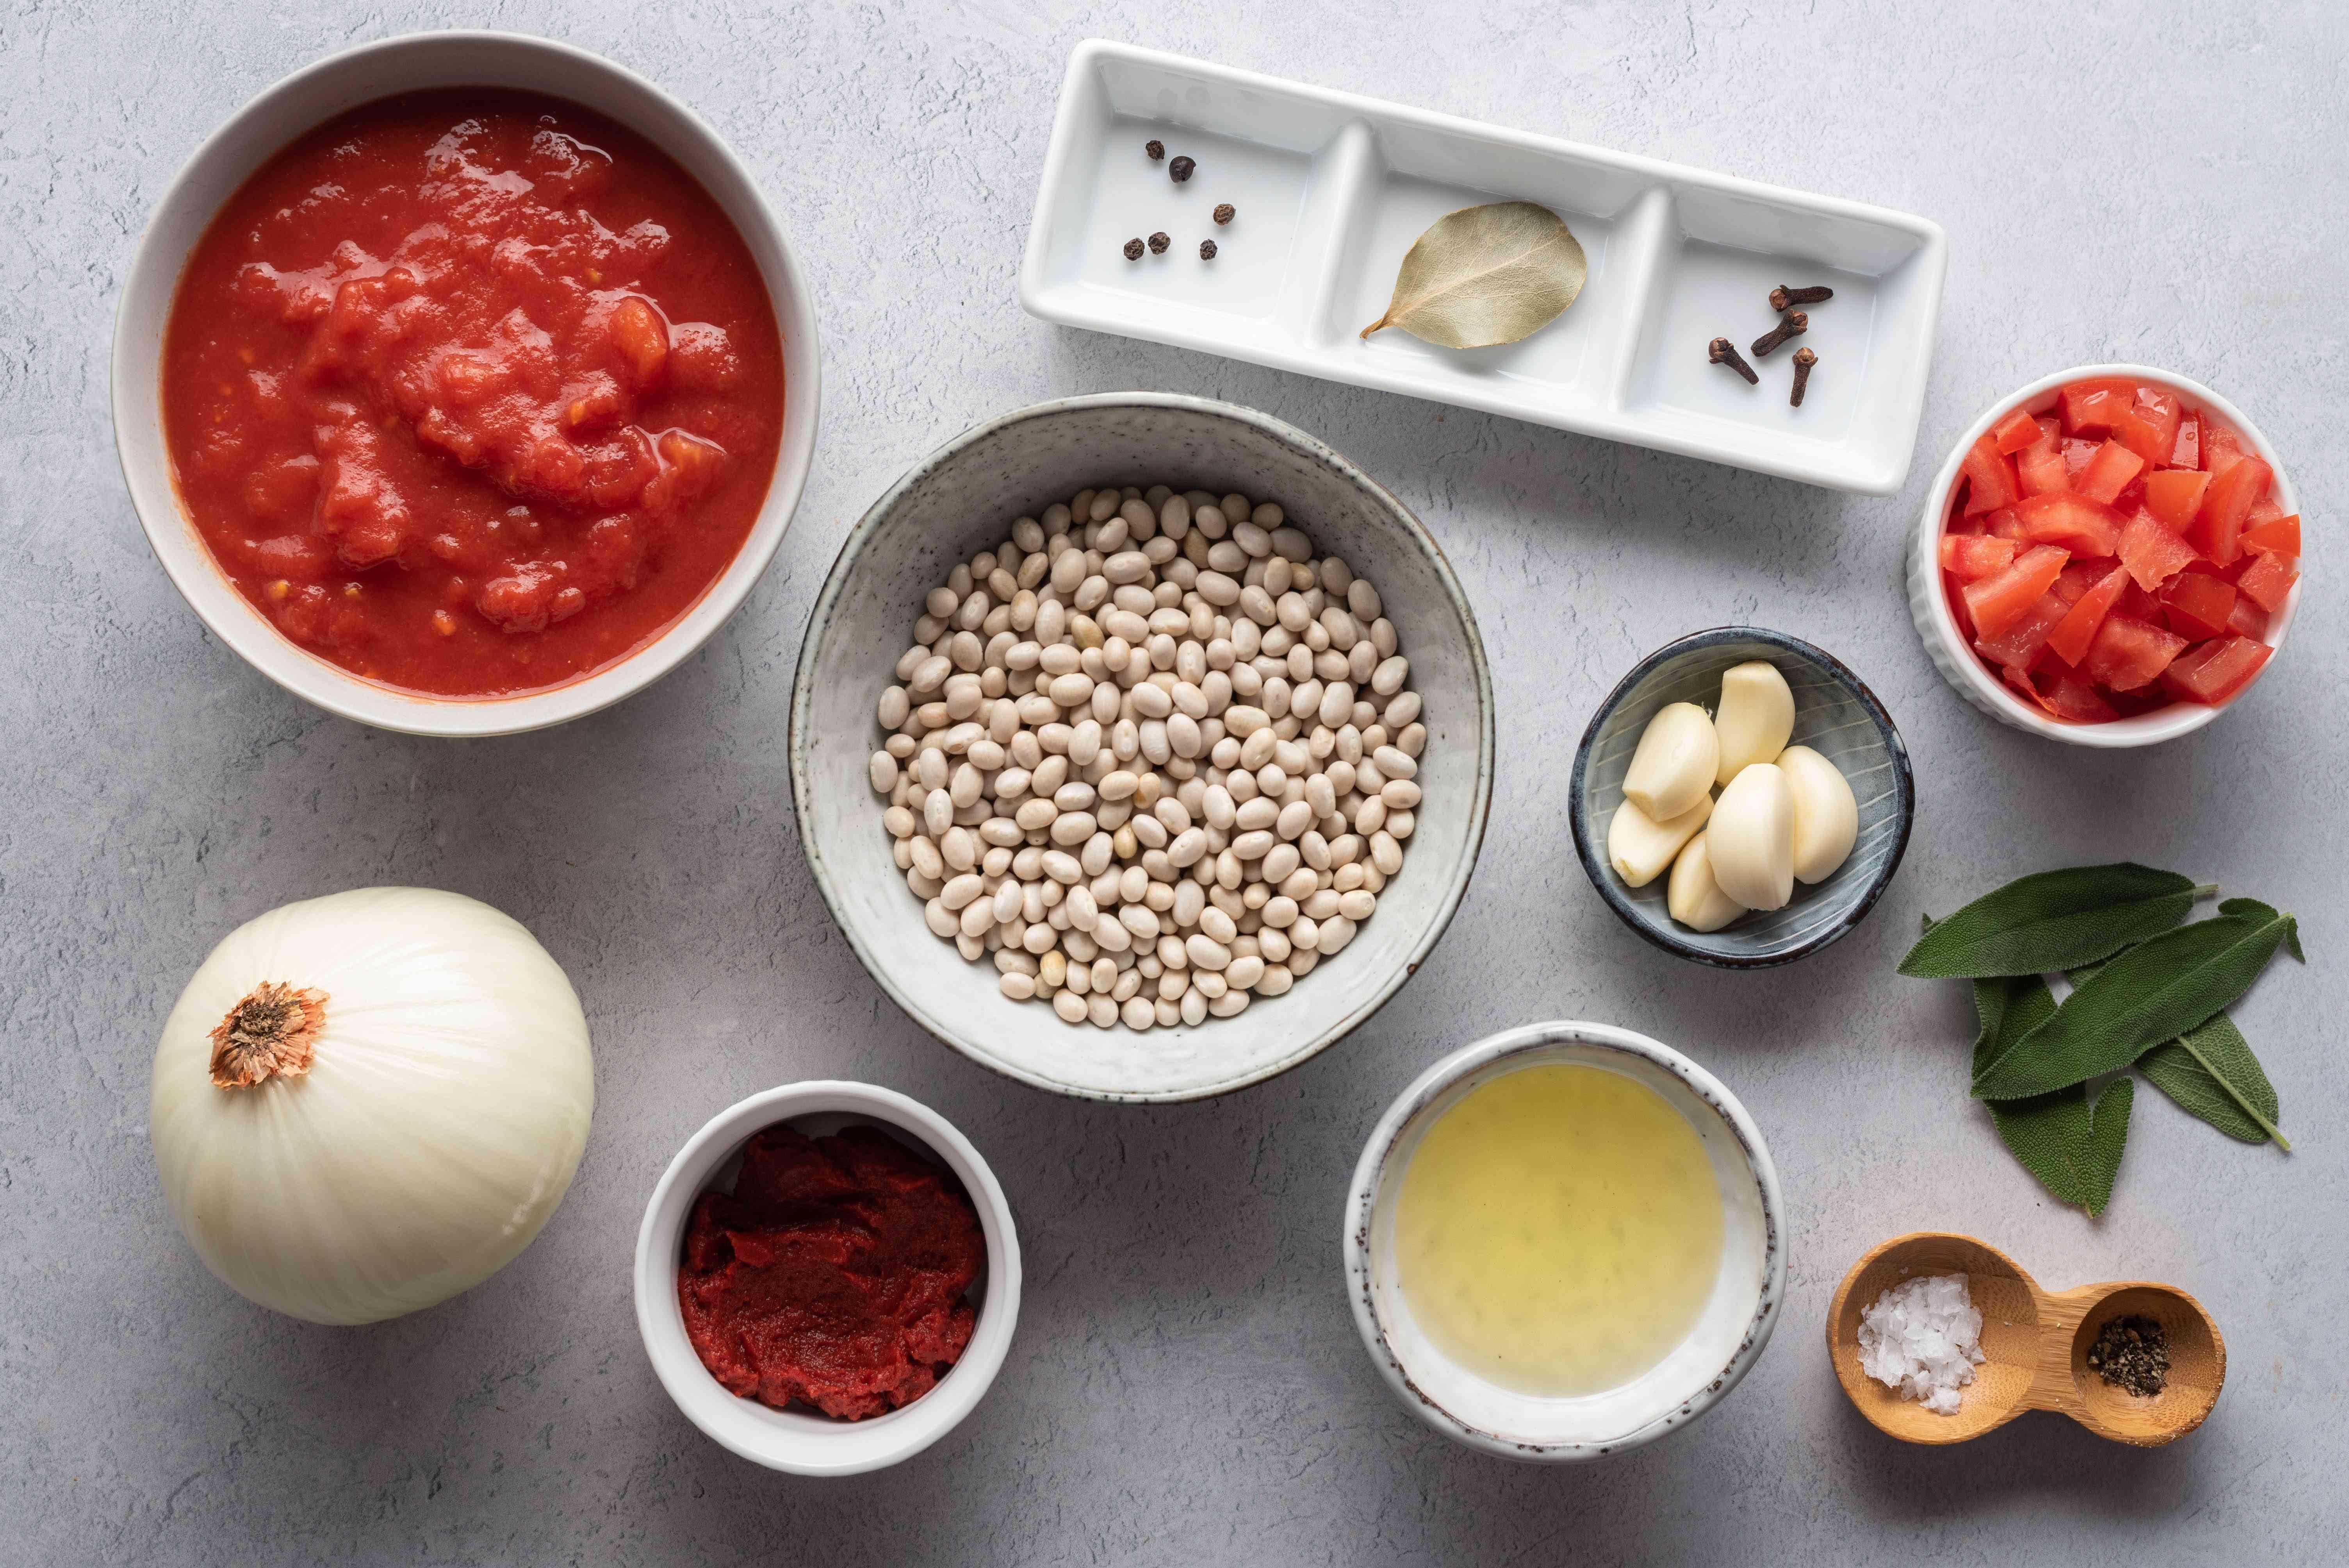 Homemade Irish Baked Beans ingredients